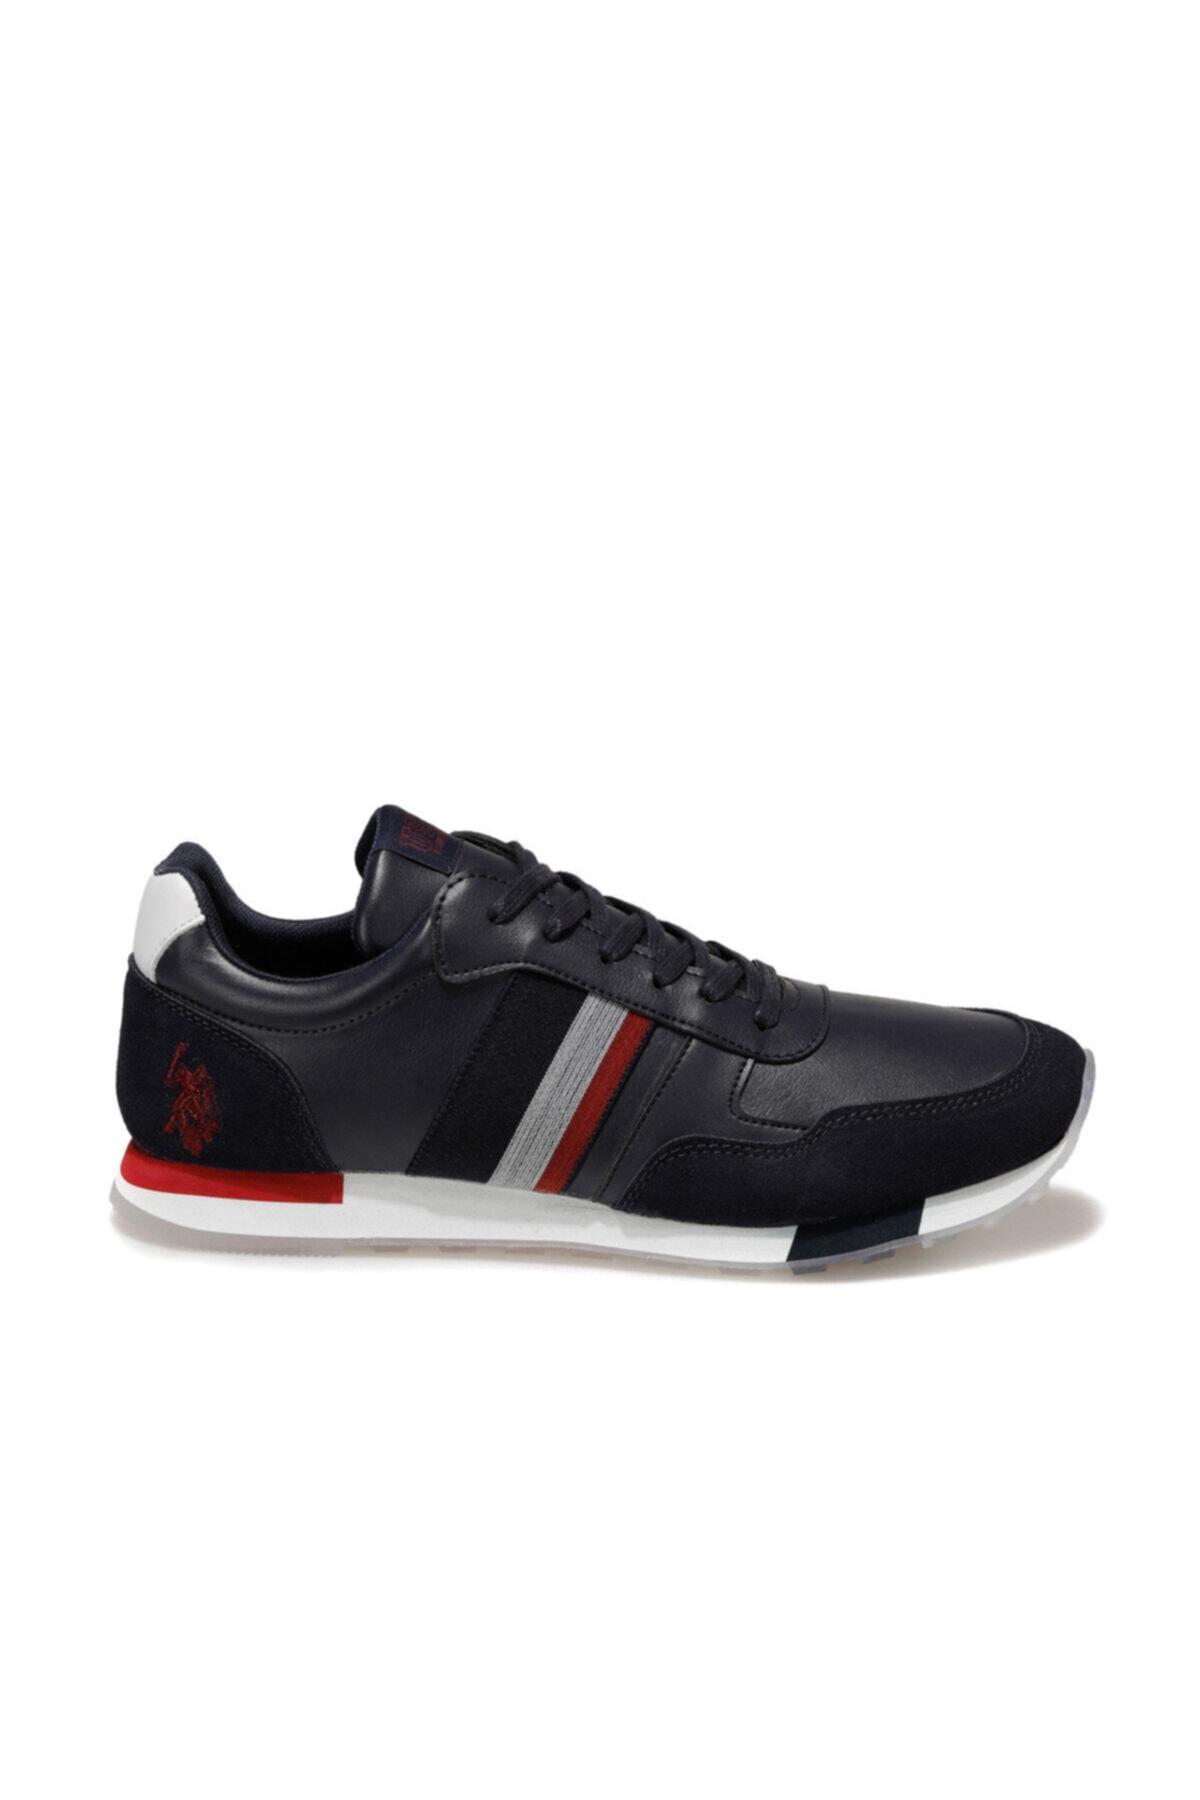 U.S. Polo Assn. BARLIN WT Lacivert Erkek Sneaker Ayakkabı 100551150 2